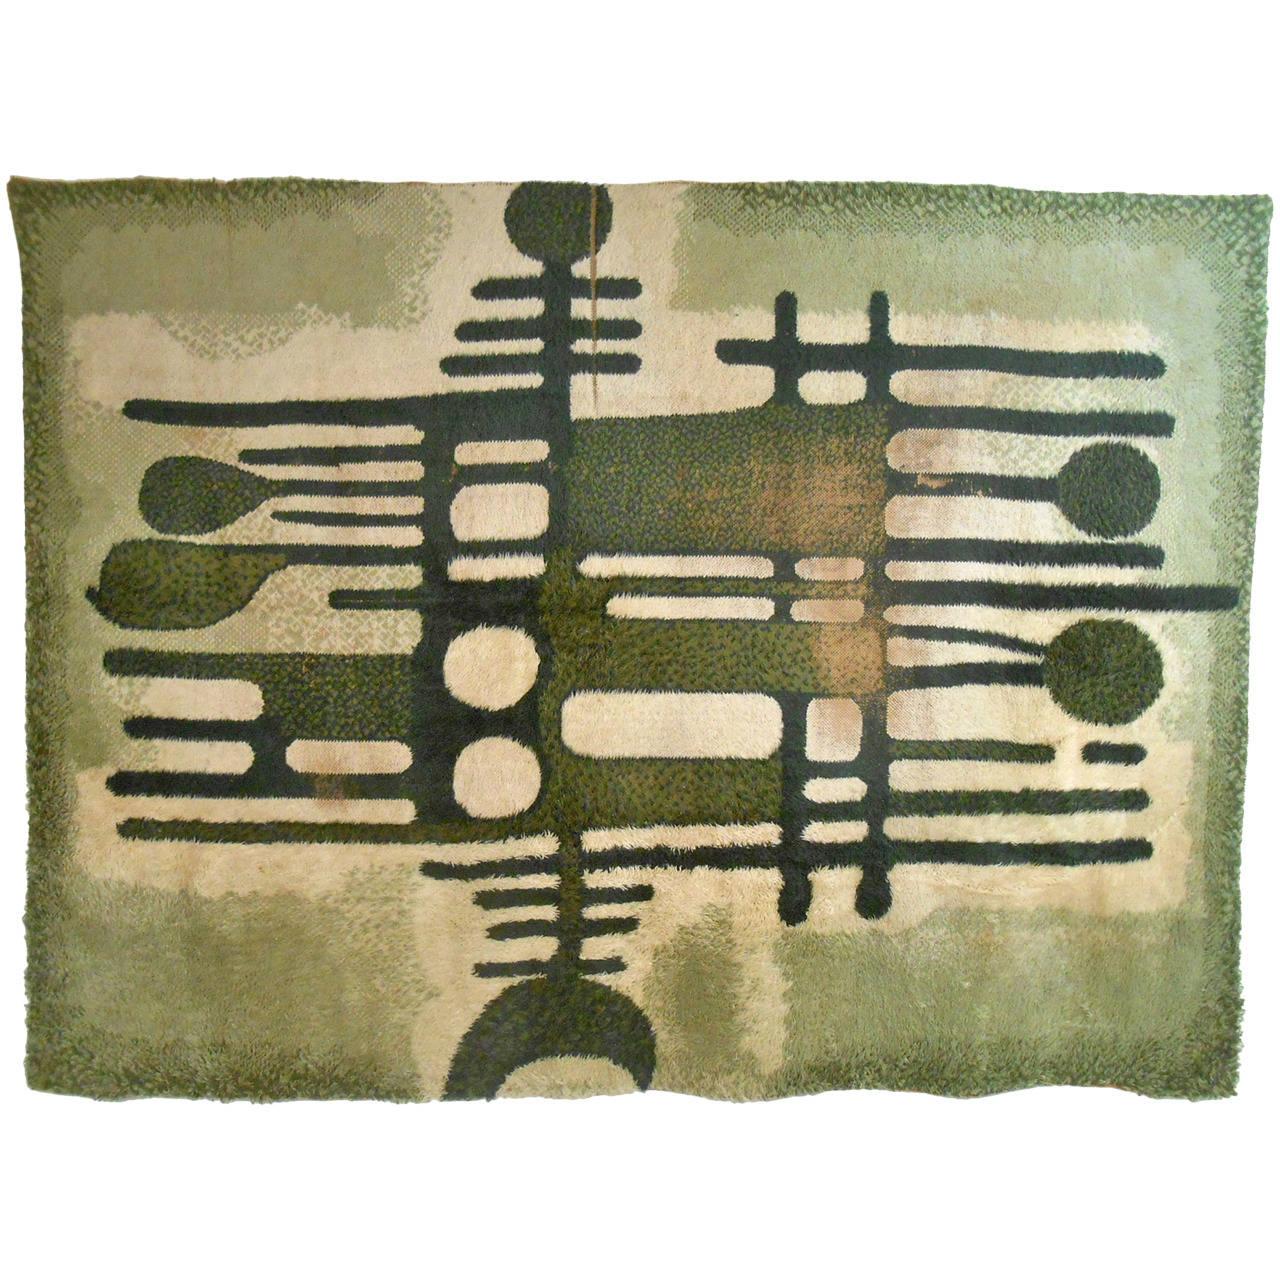 Large Mid-Century Modern Abstract Shag Rug